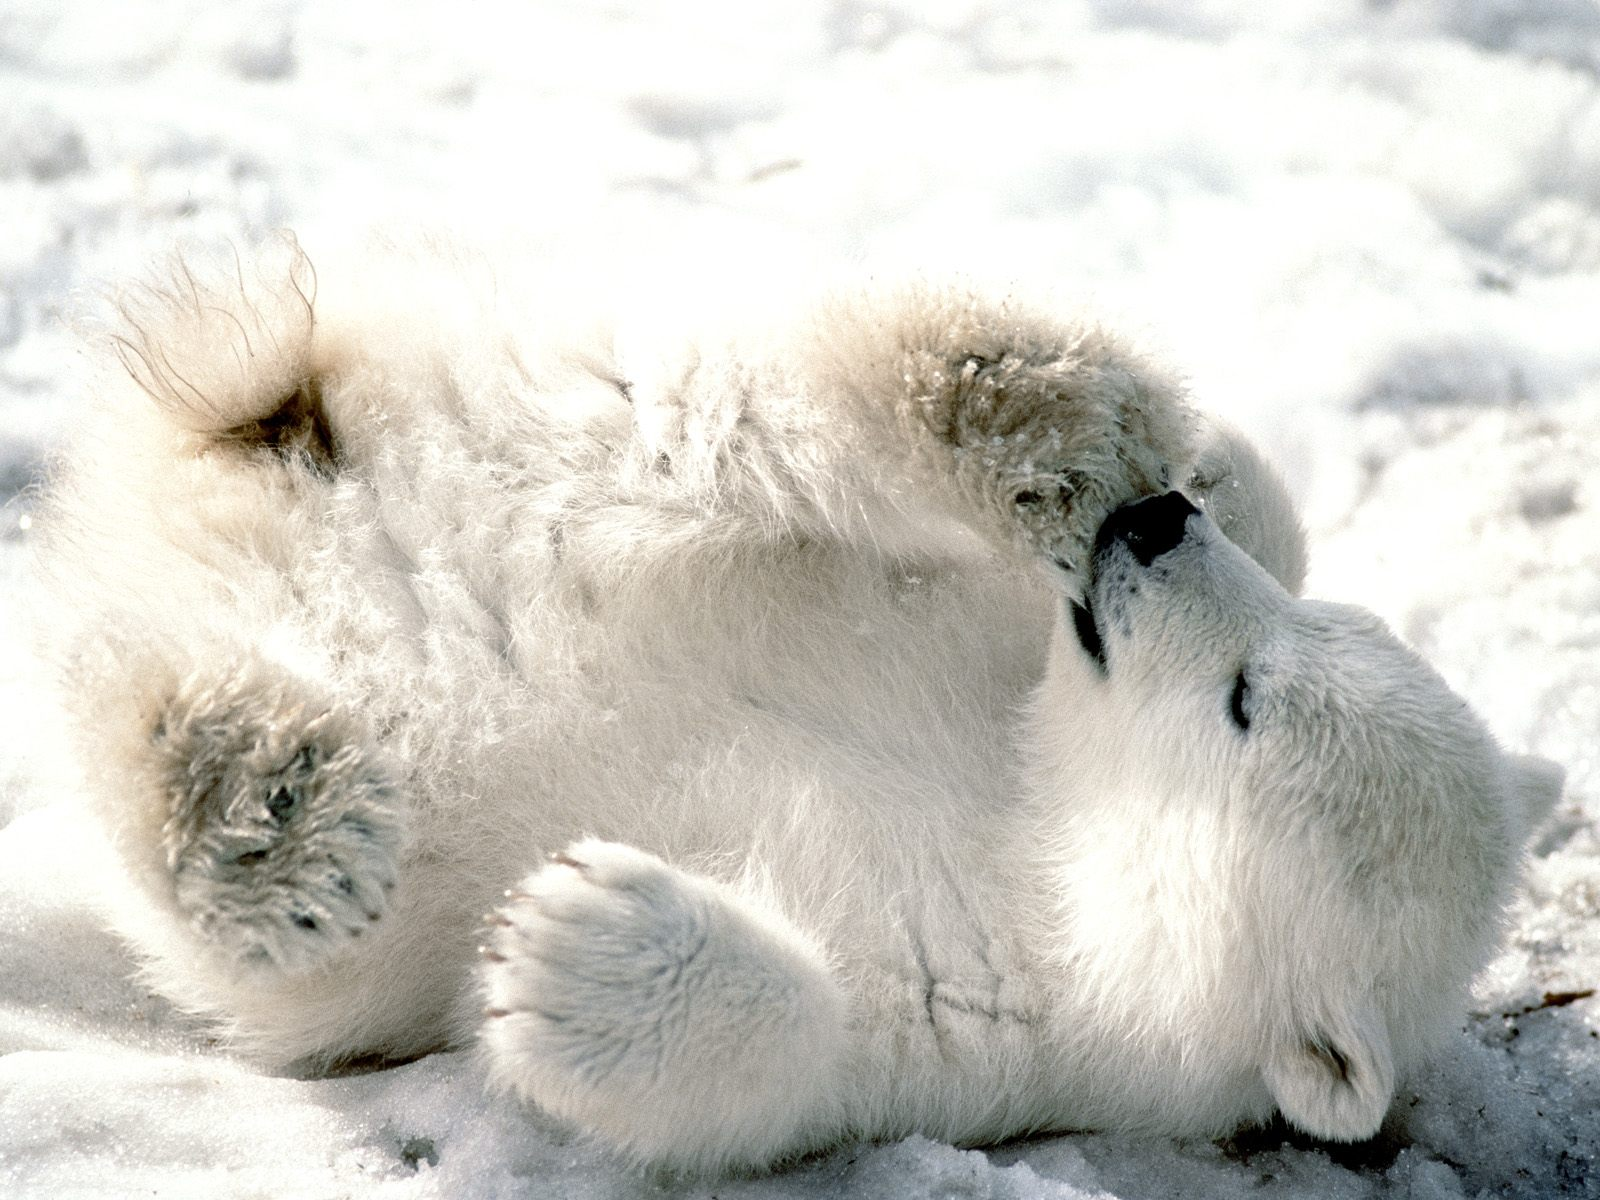 http://4.bp.blogspot.com/-8XvgjQsSgjM/Tk6QYGQ6WcI/AAAAAAAADYY/lgF_0yKCv64/s1600/Playful+Baby+Polar+Bear.jpg